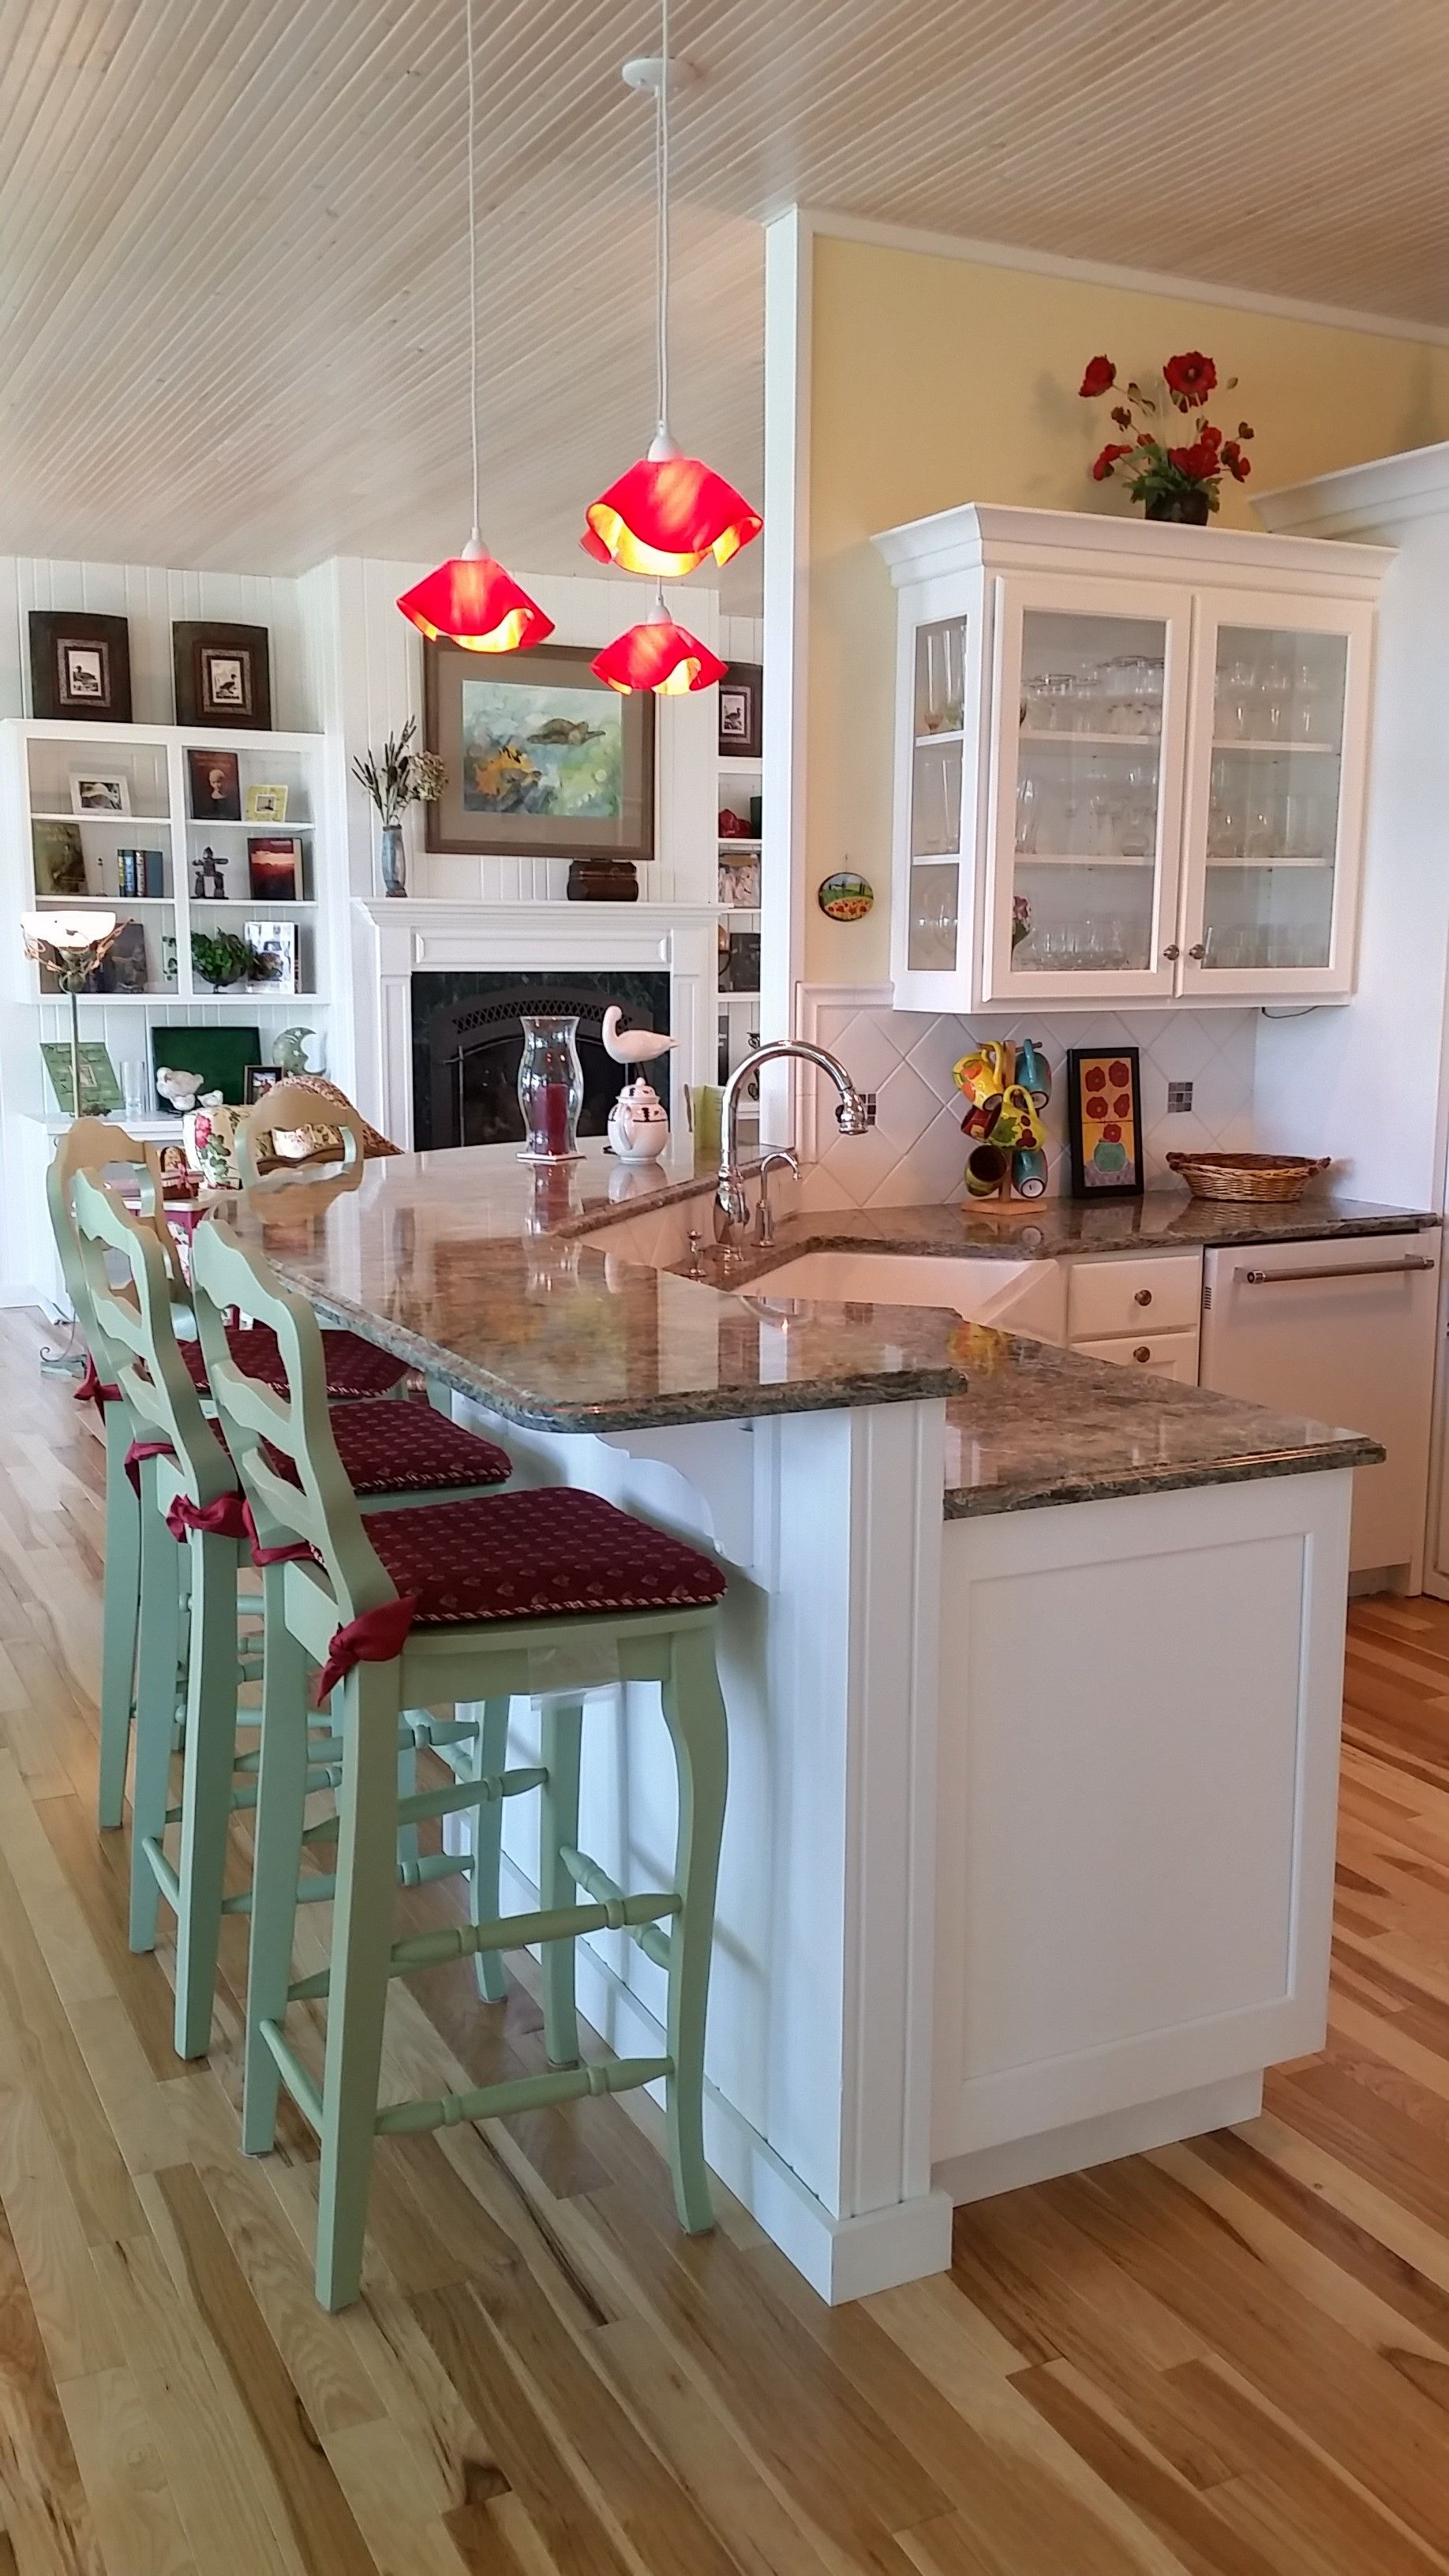 Kitchens New And Remodels Kalamazoo Custom Kitchens And Baths Inc Kitchen Bar Custom Kitchens Kitchen Inspirations